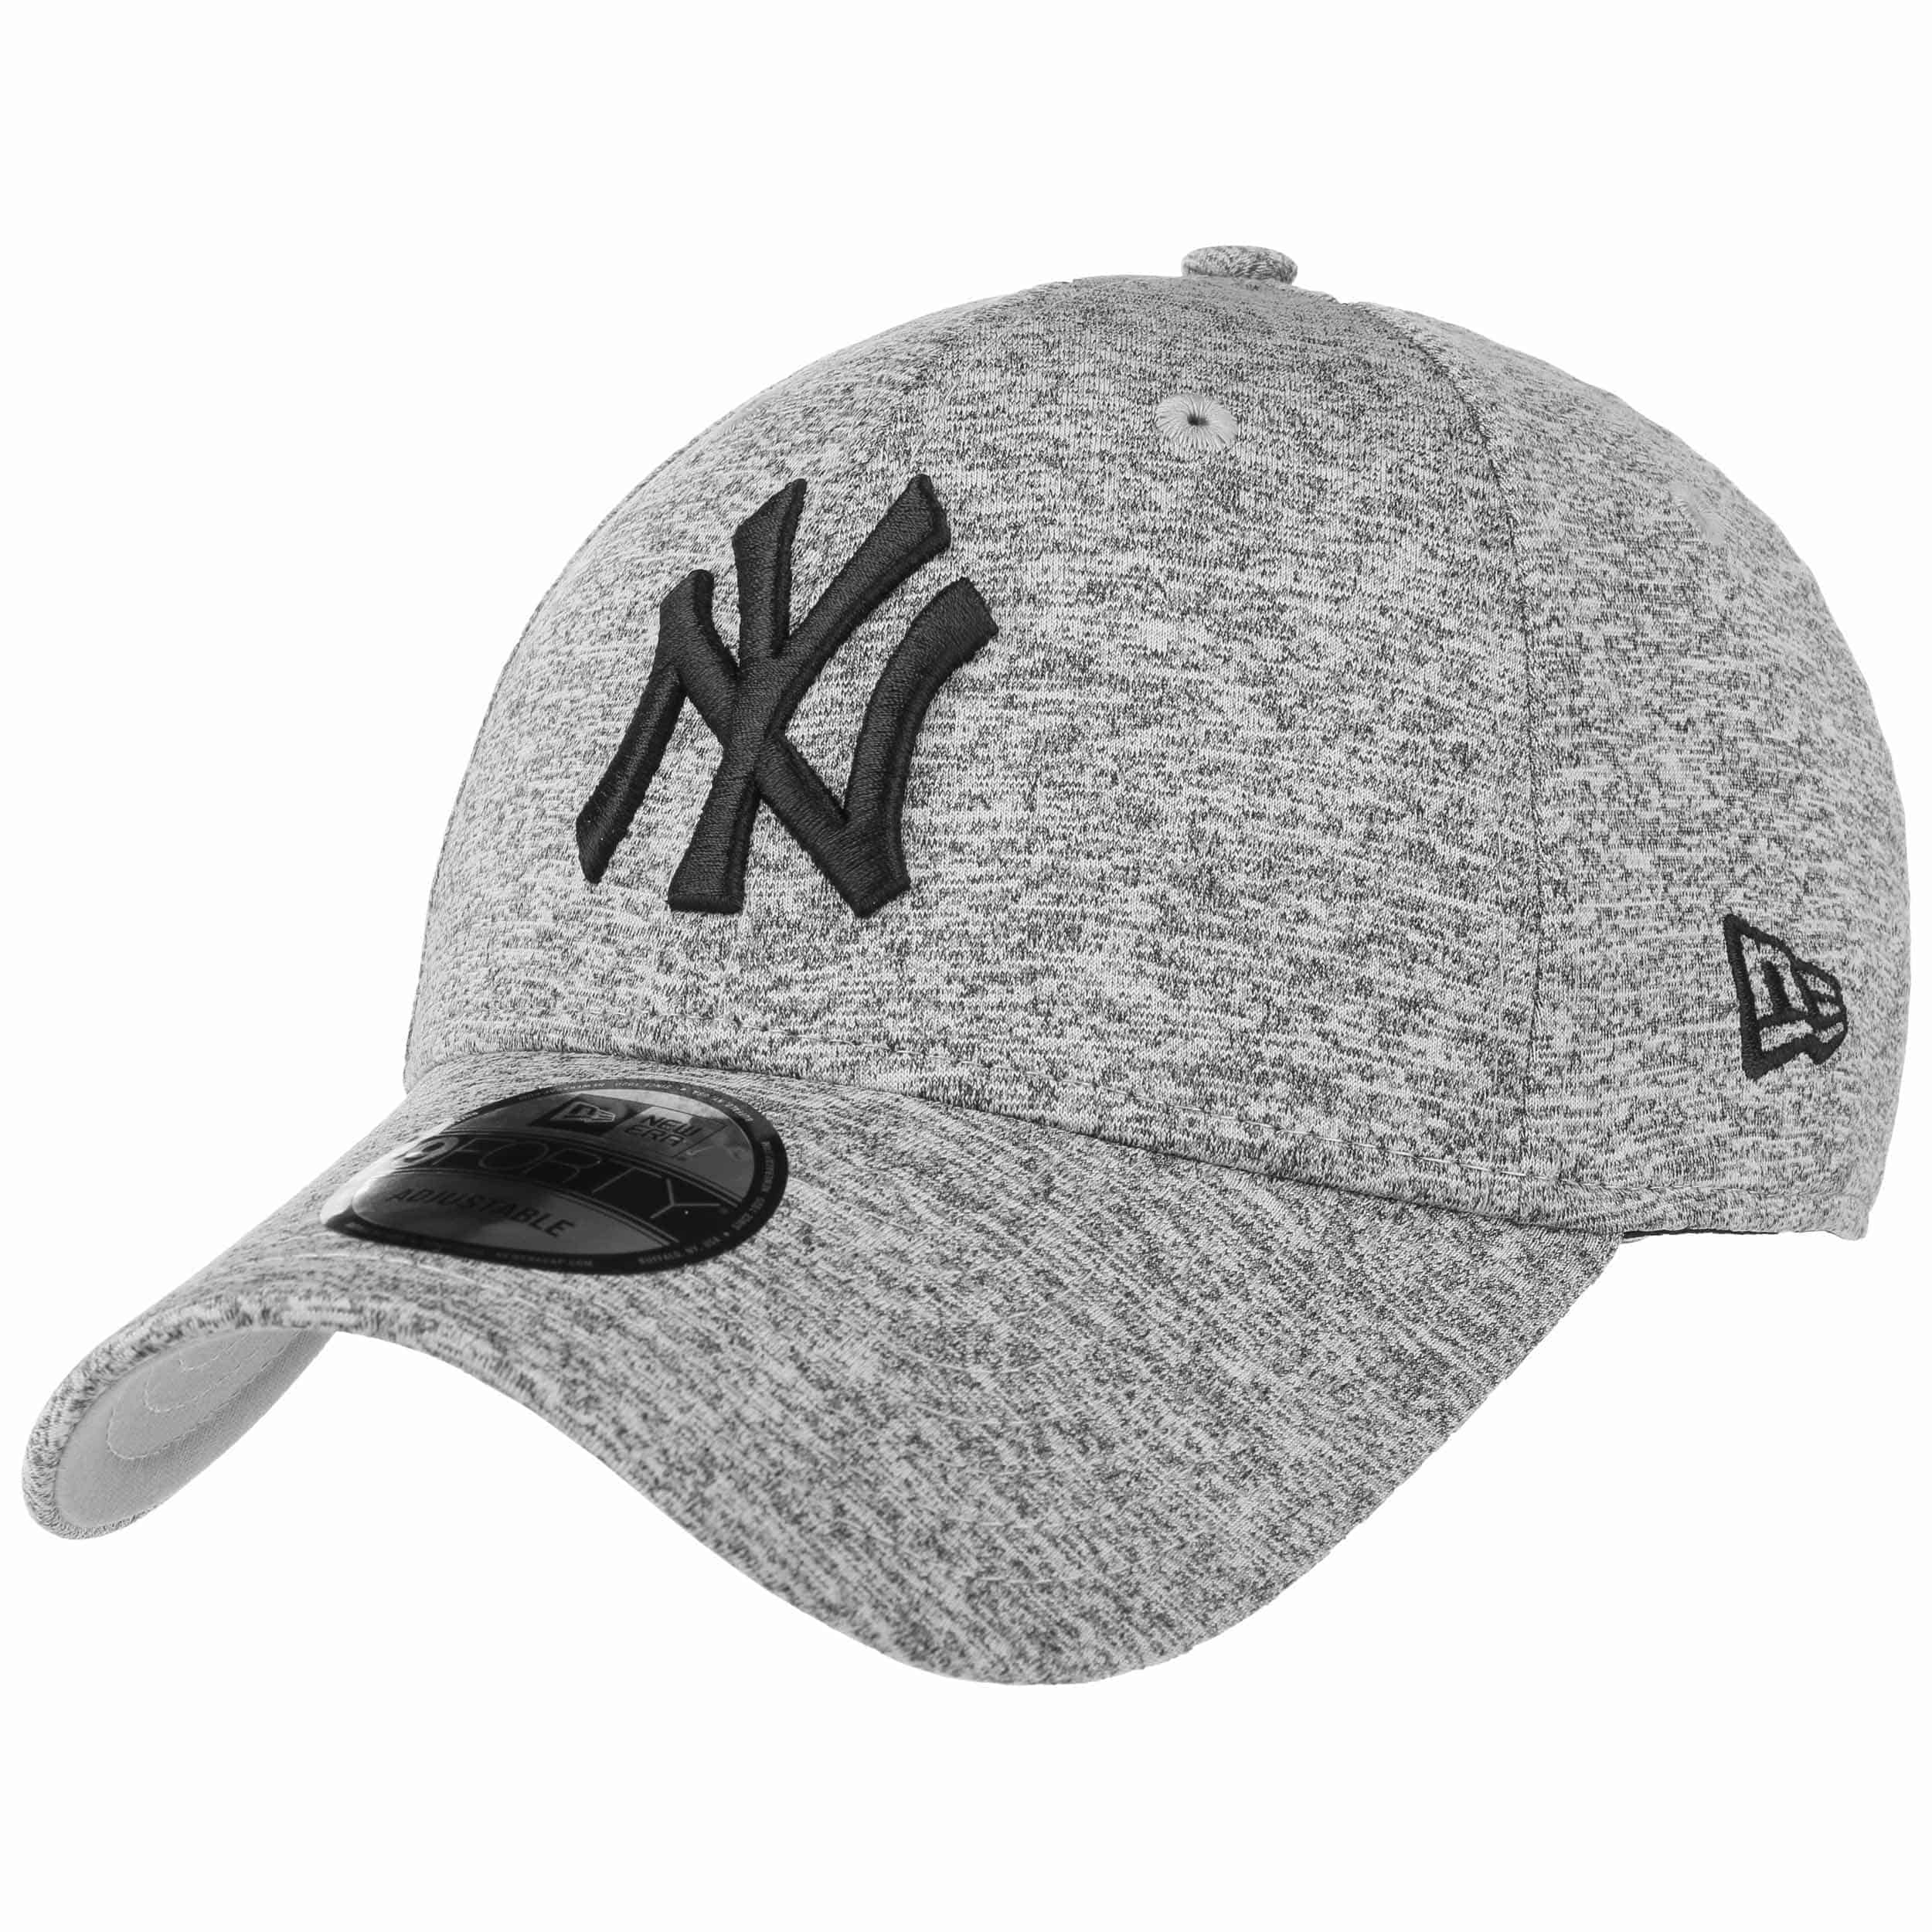 JERSEY New York Yankees grau New Era 39Thirty Cap